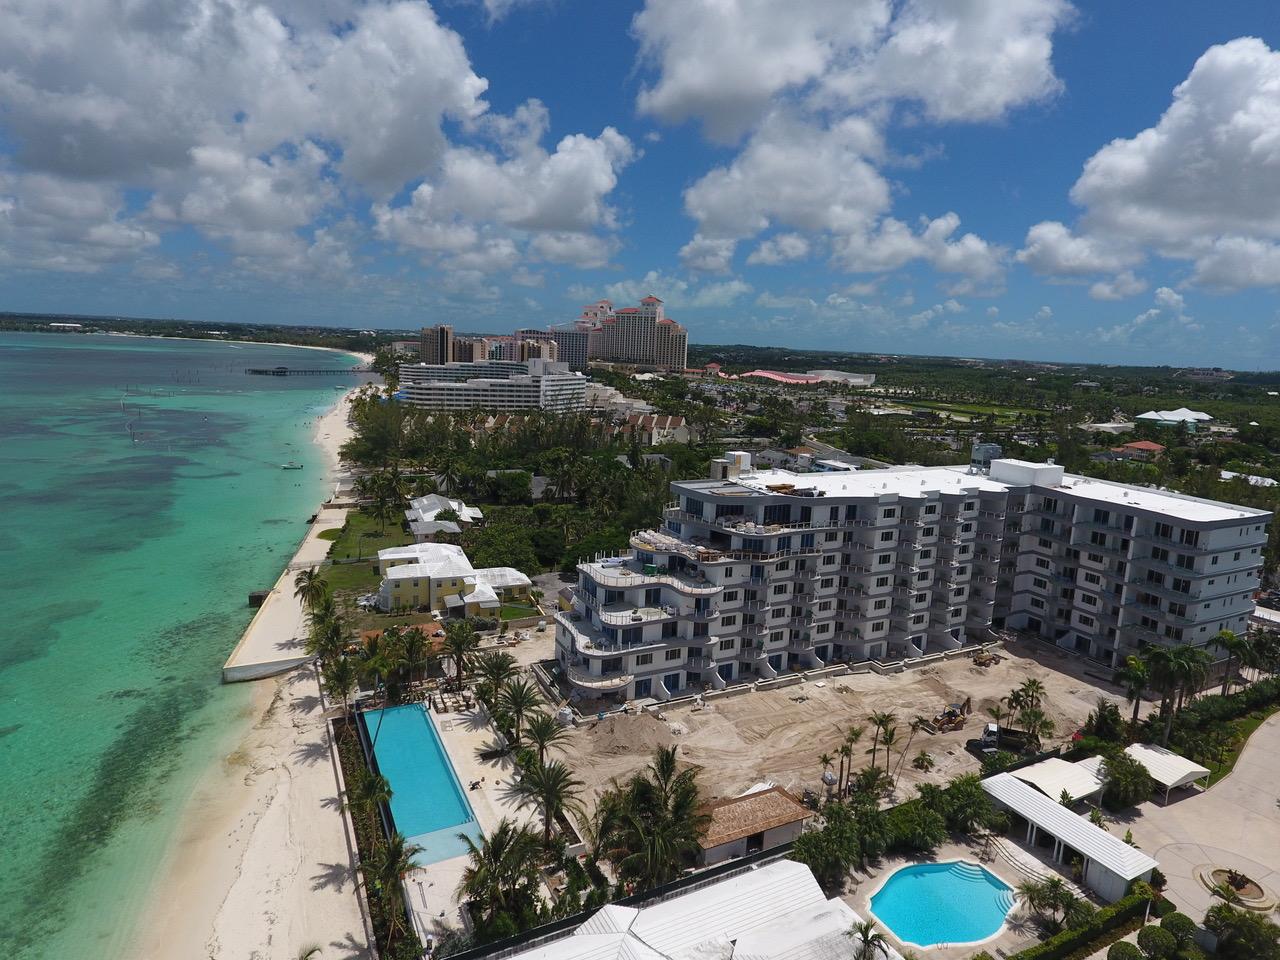 Co-op / Condo for Sale at Stunning Beachfront Condos near BahaMar One Cable Beach, Cable Beach, Nassau And Paradise Island Bahamas